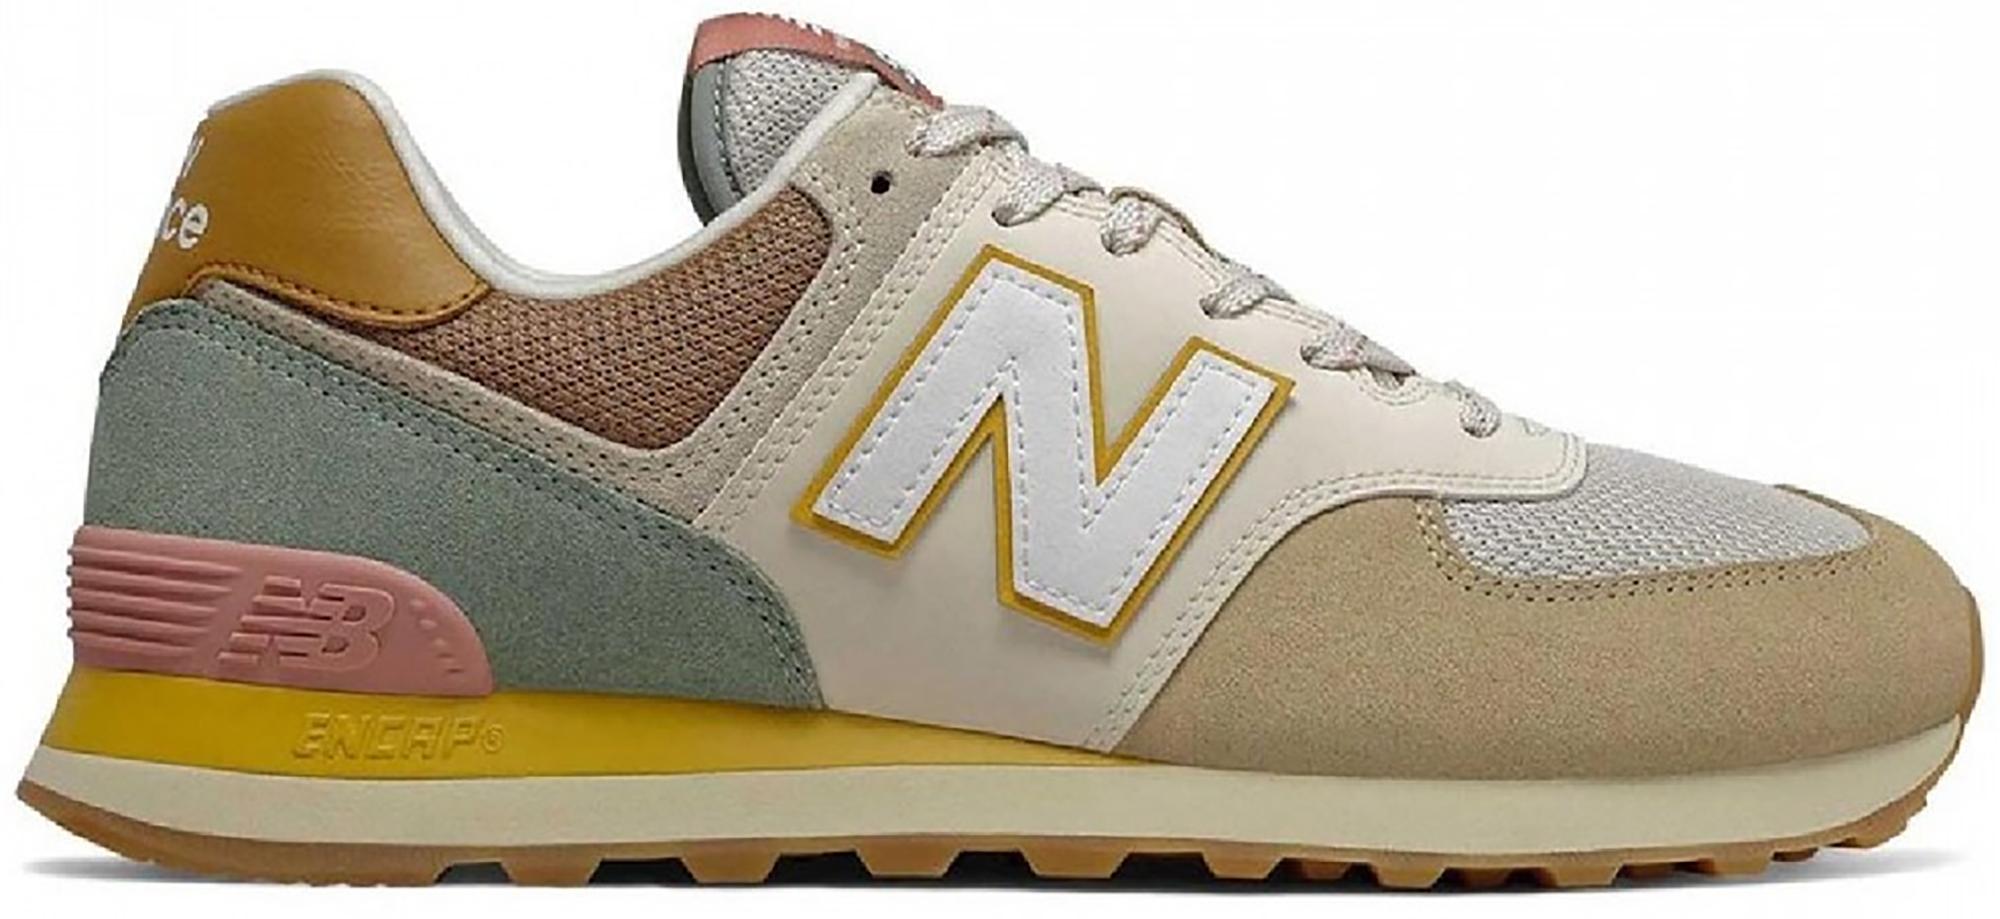 New Balance 574 Brown Beige - ML574SOT